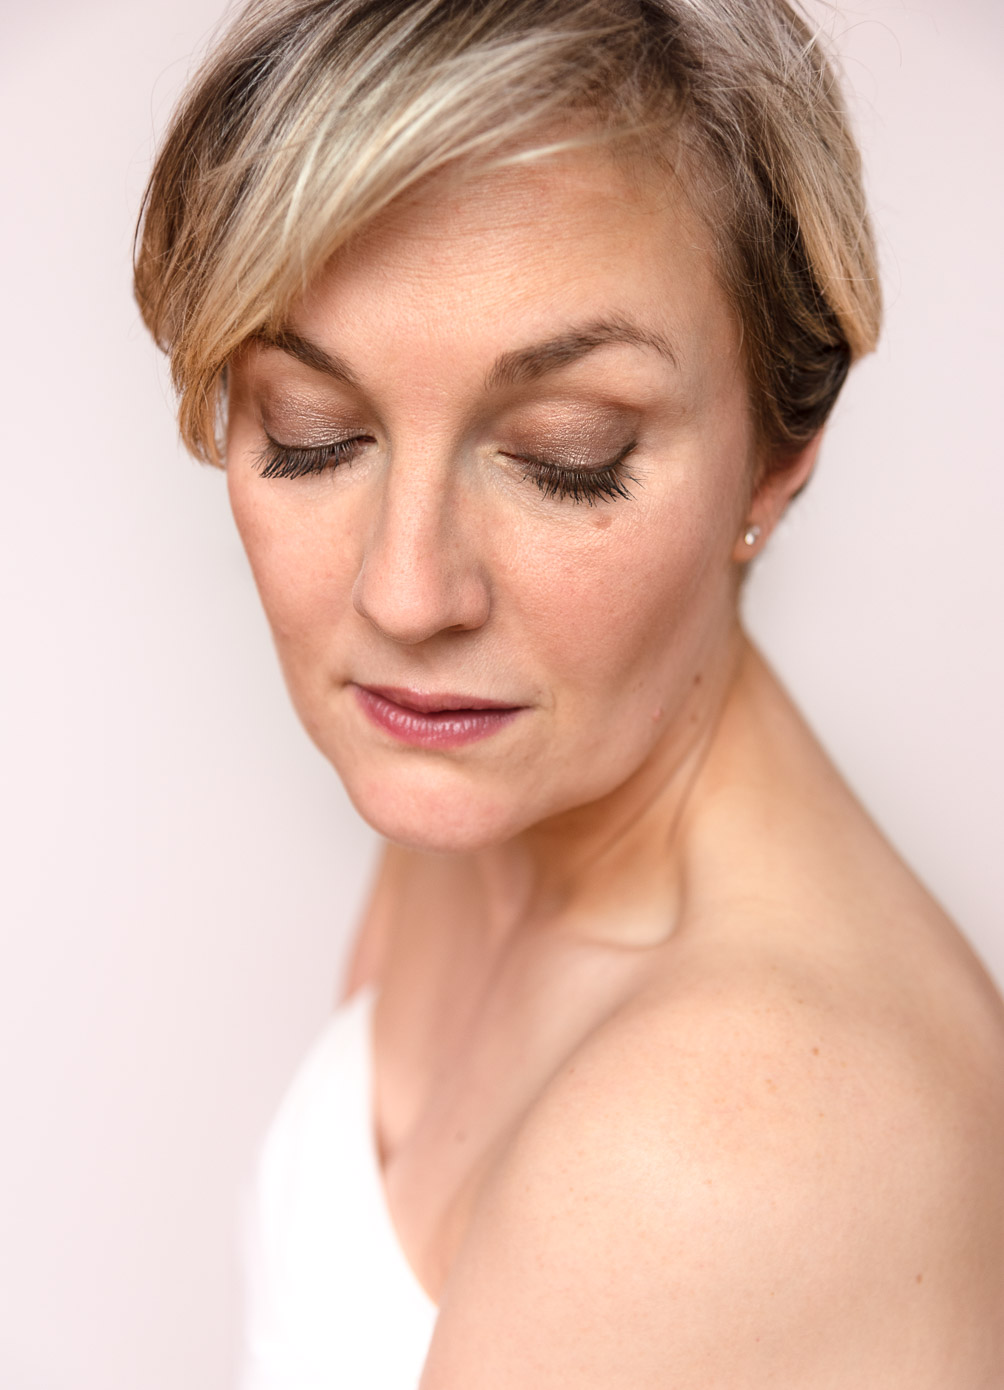 Isa FineArt Photography Portrait professionnel